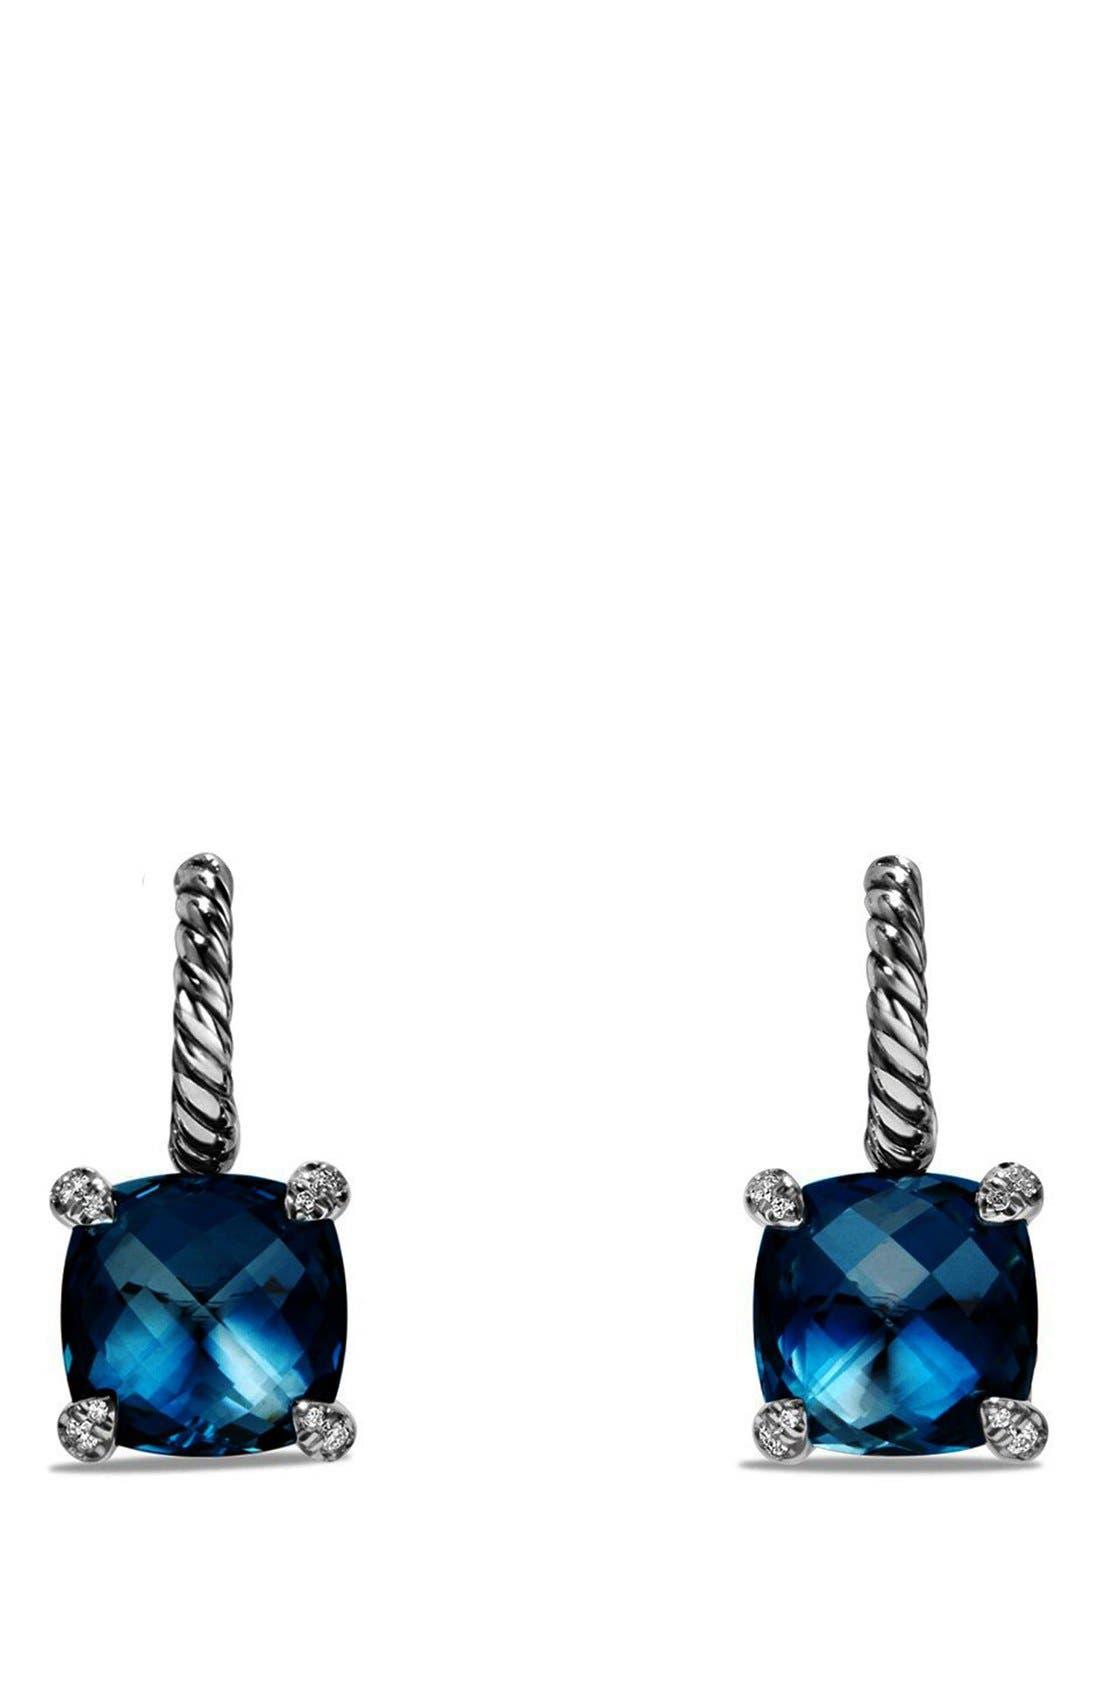 'Châtelaine' Drop Earrings with Semiprecious Stones and Diamonds,                         Main,                         color, Silver/ Hampton Blue Topaz